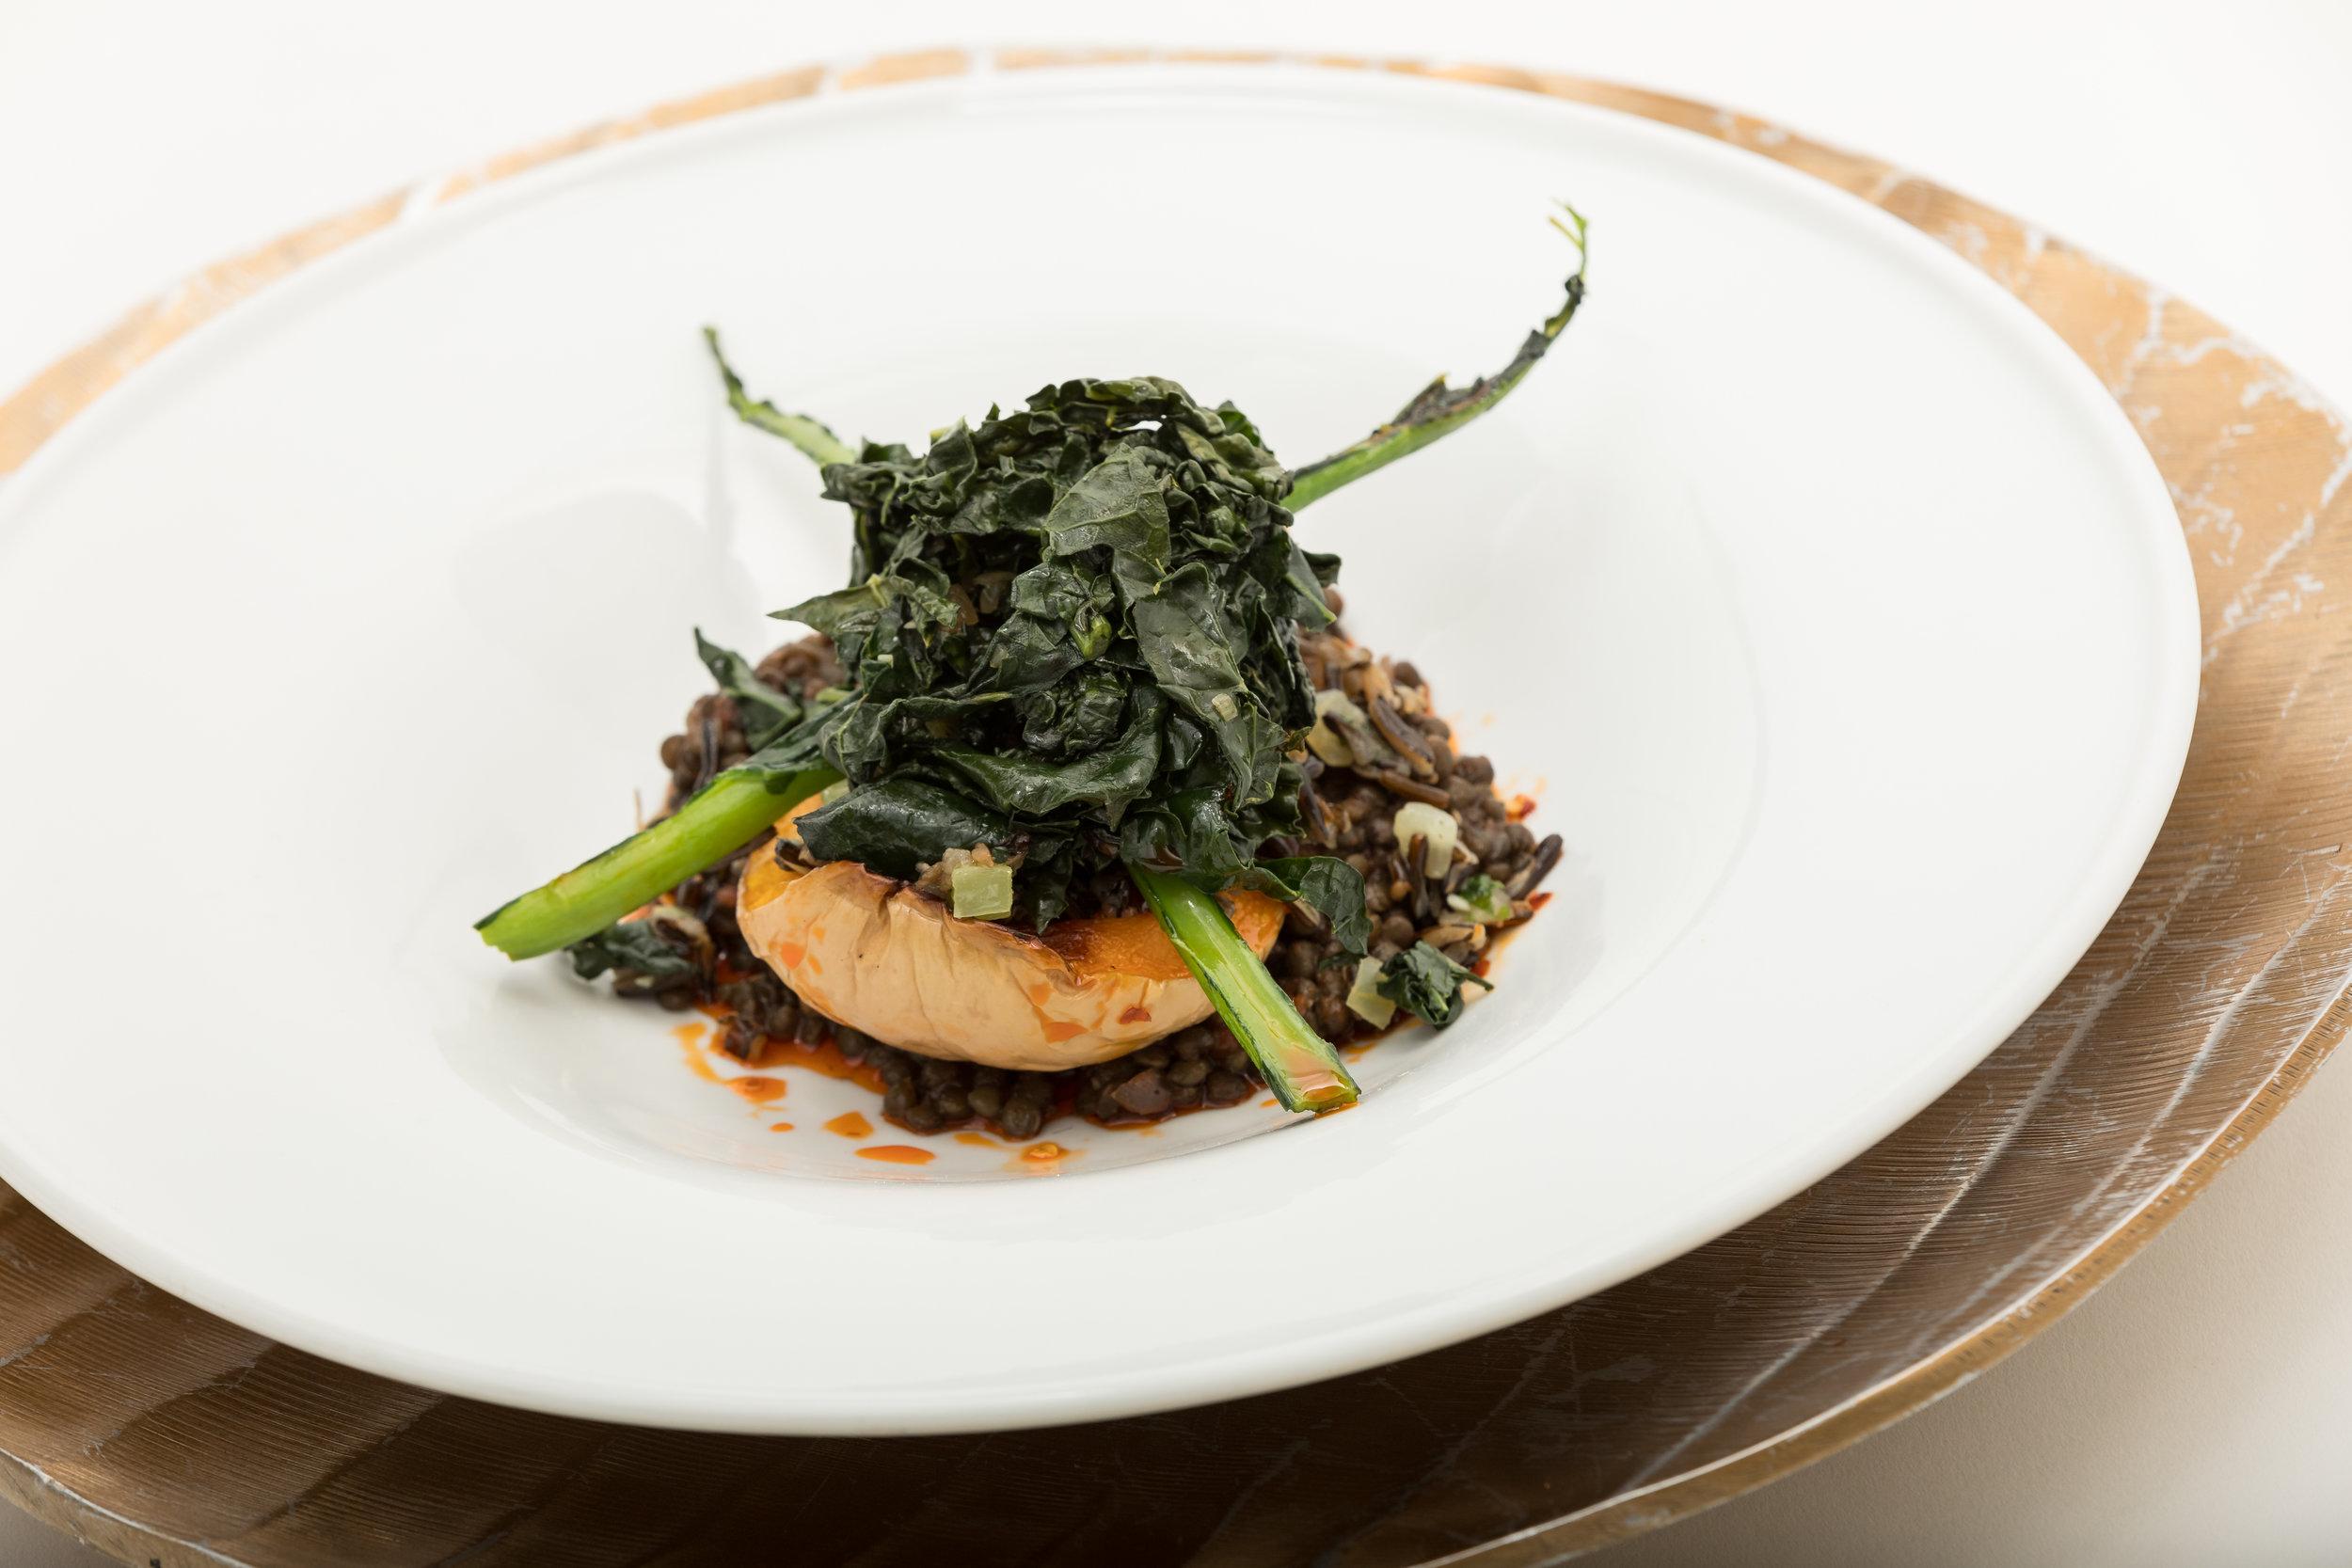 Five-Spice Beluga Lentils & Roast Butternut Squash w_Wild Rice, Greens, Chili Oil & Black Vinegar_Amanda Gentile7.jpg